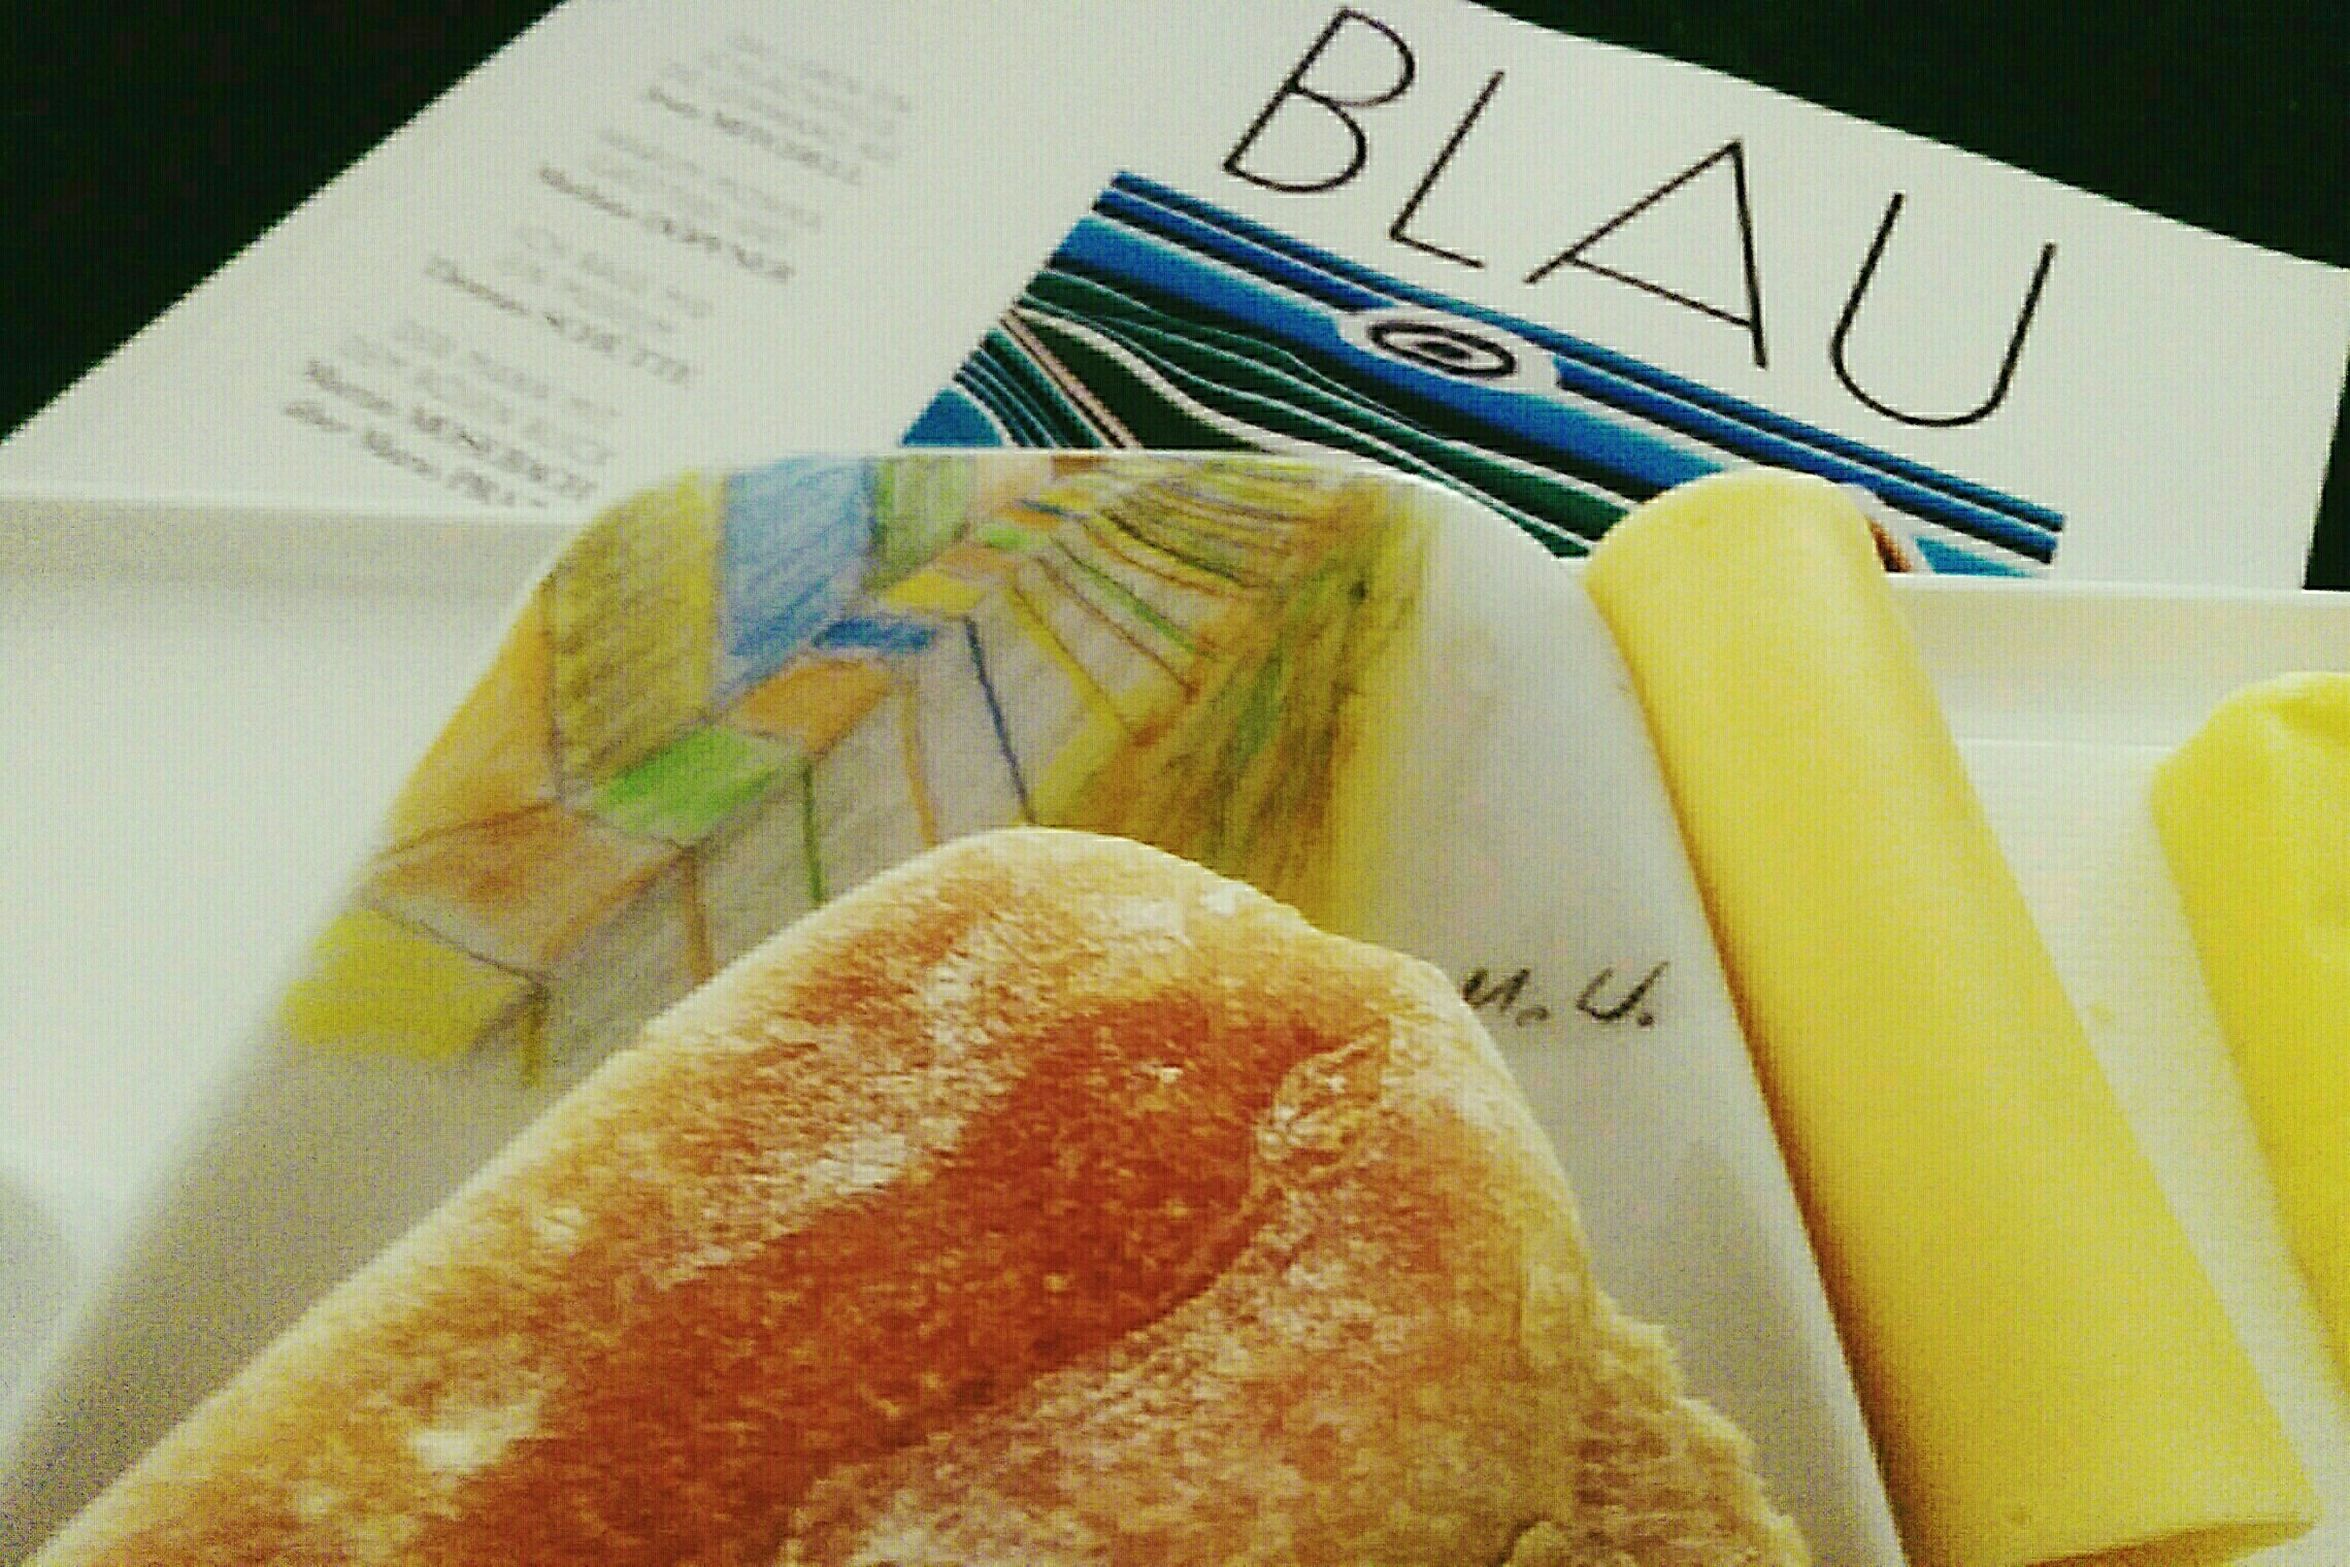 Breakfast with Love 41 Drawing by Mylove + Morning Bettlektüre Kunst Magazine Blau